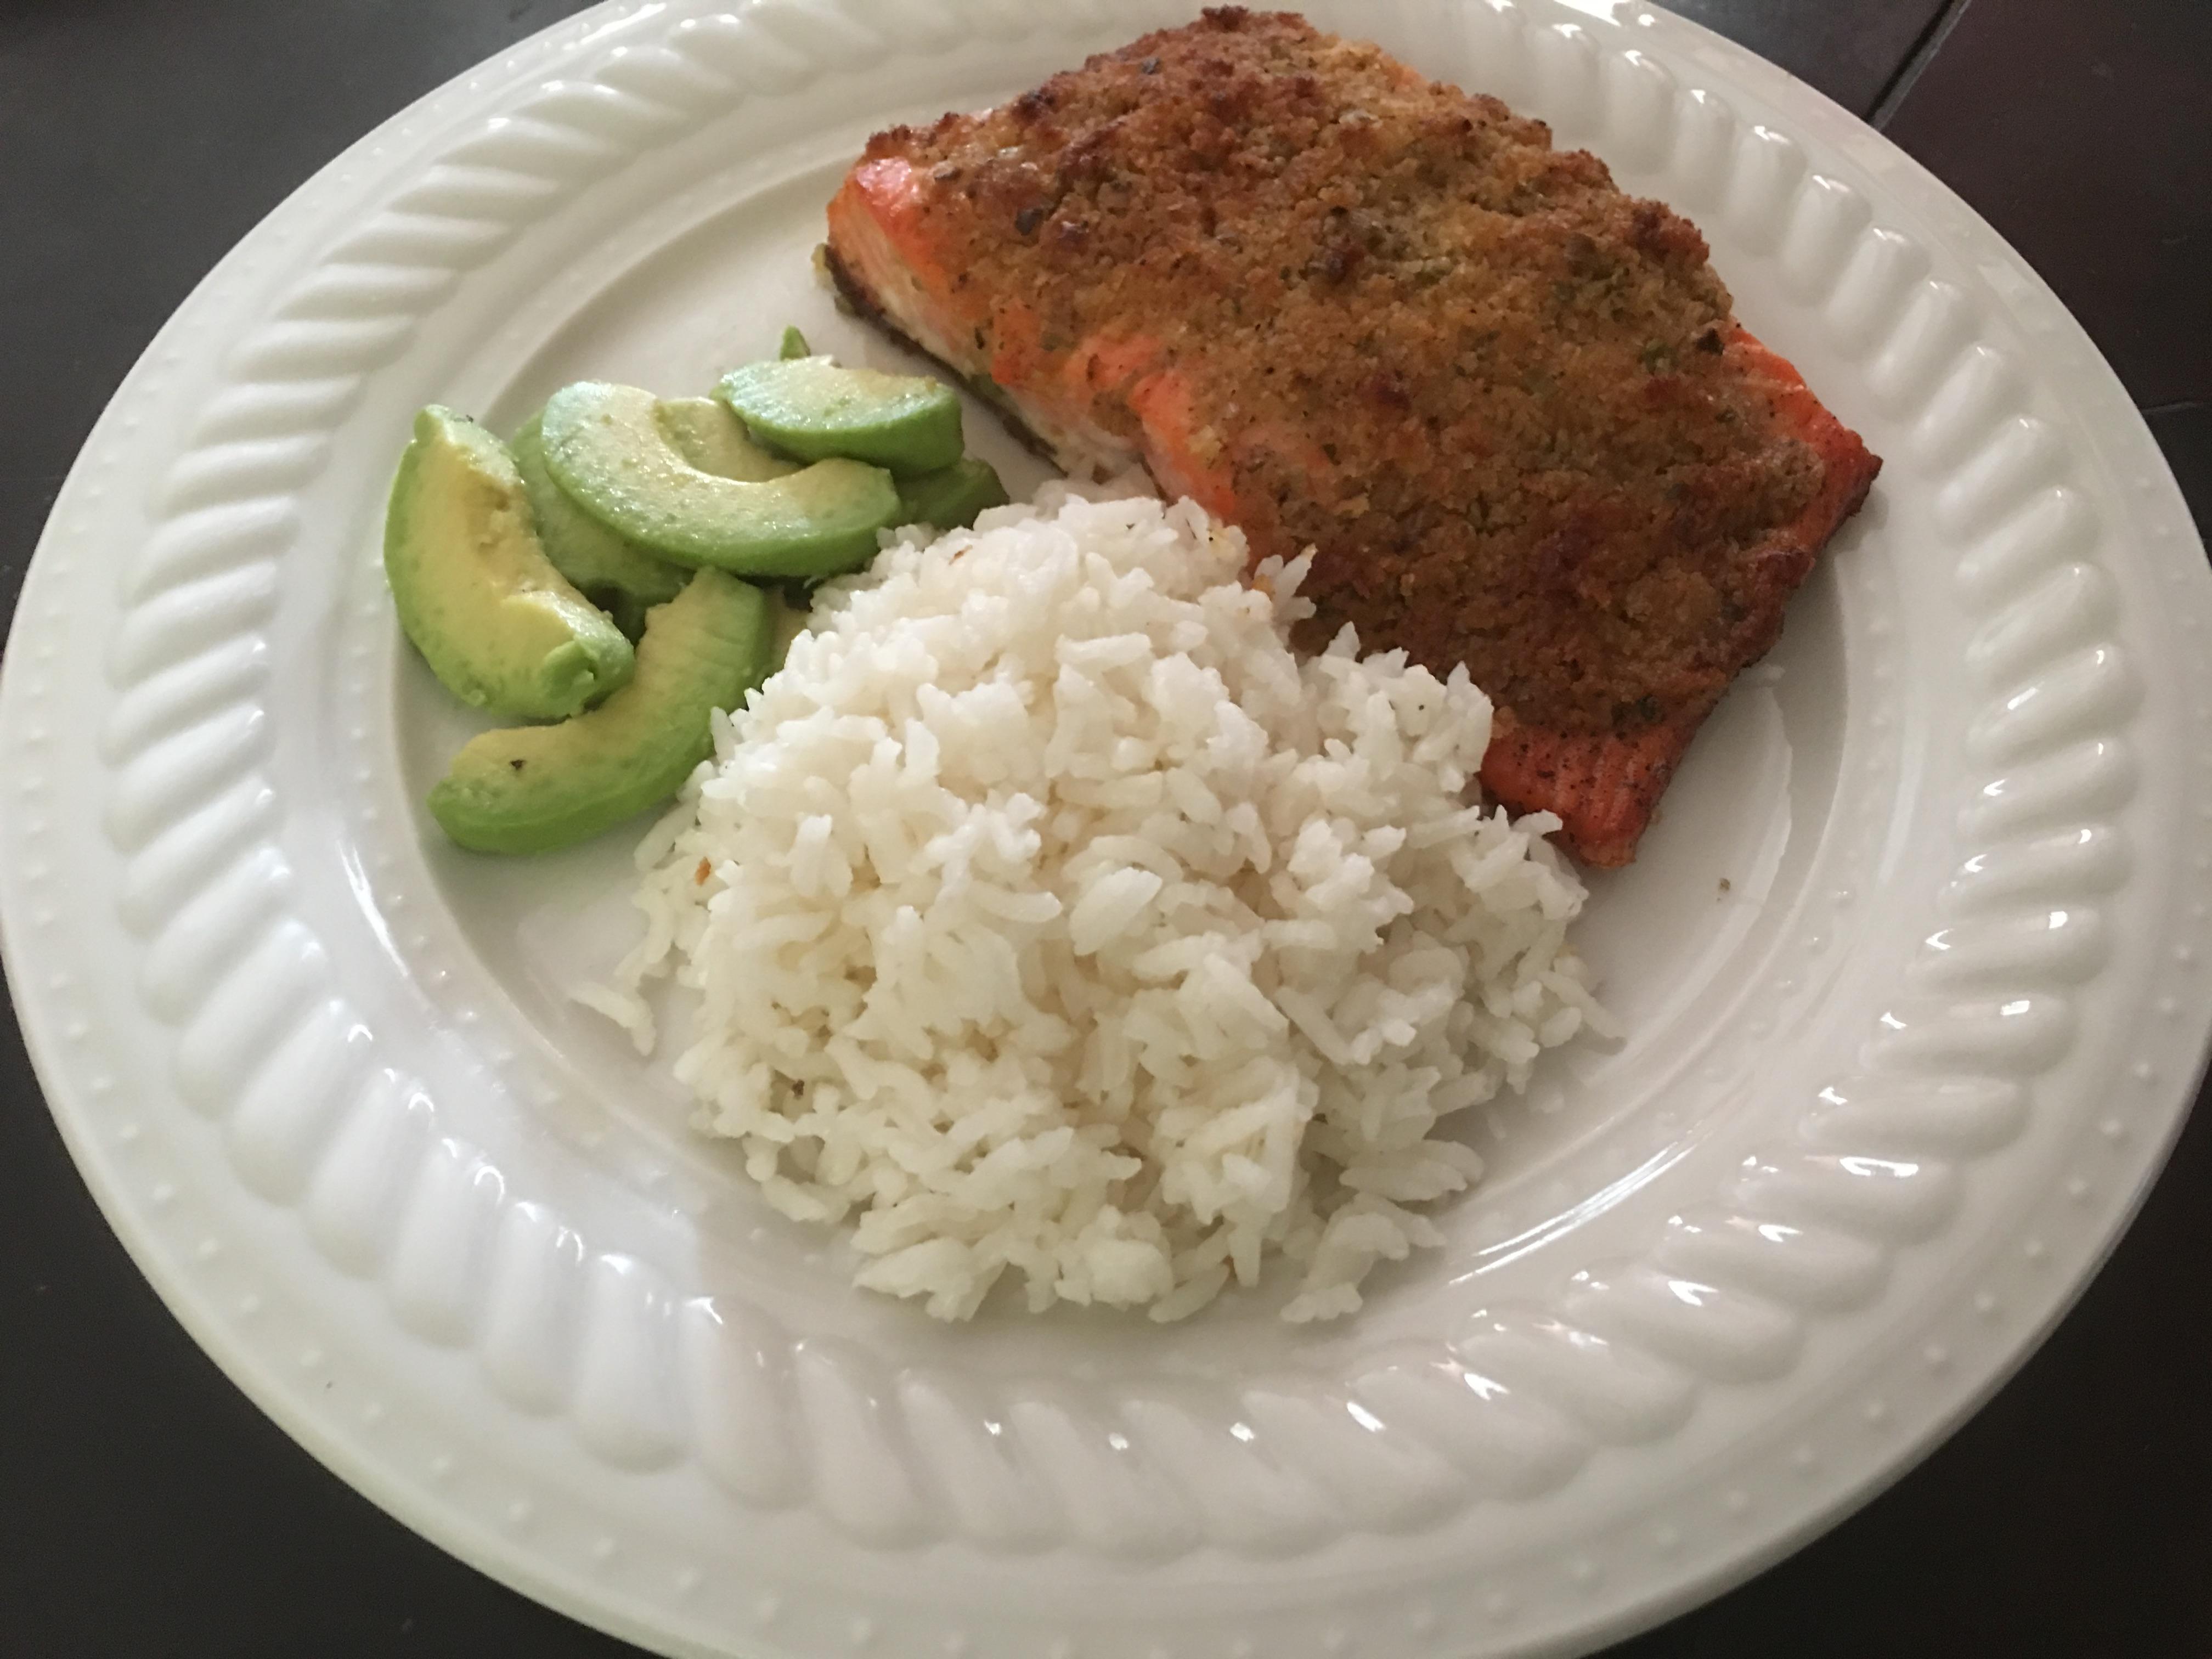 Delicious Feta-Crusted Salmon Chef Roy